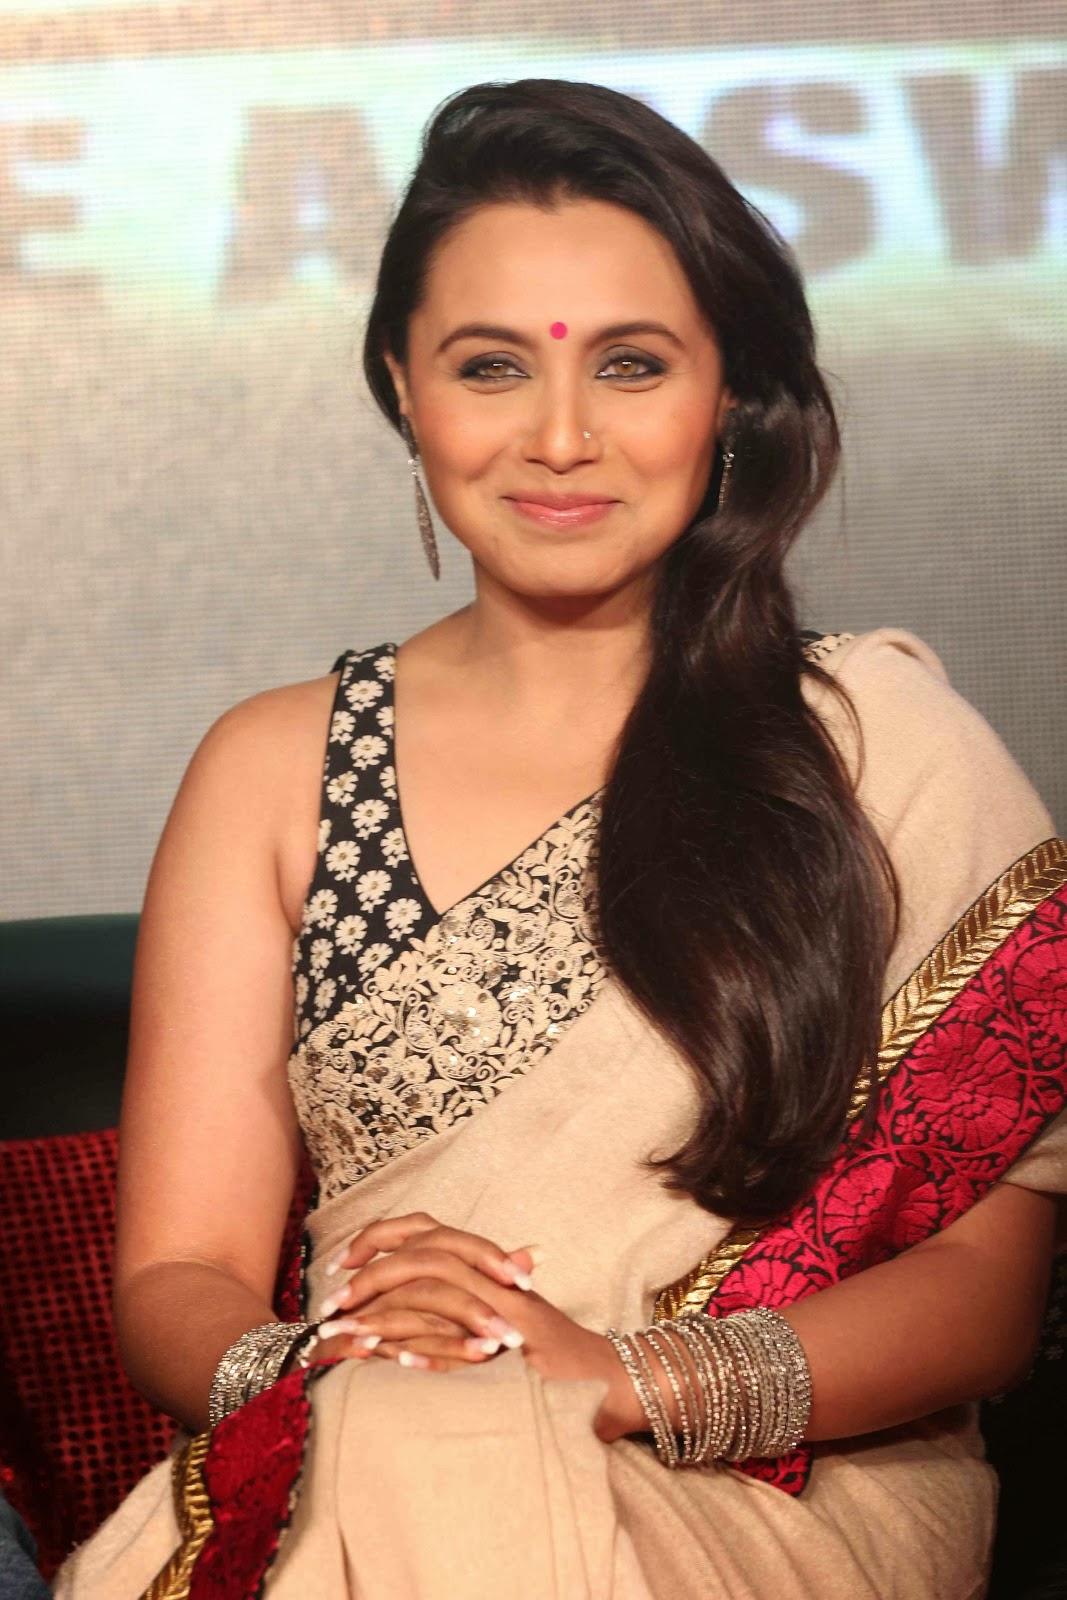 Rani Mukherjee Hot Sexy Pose Images In Saree Celebrity Images 1067 x ...